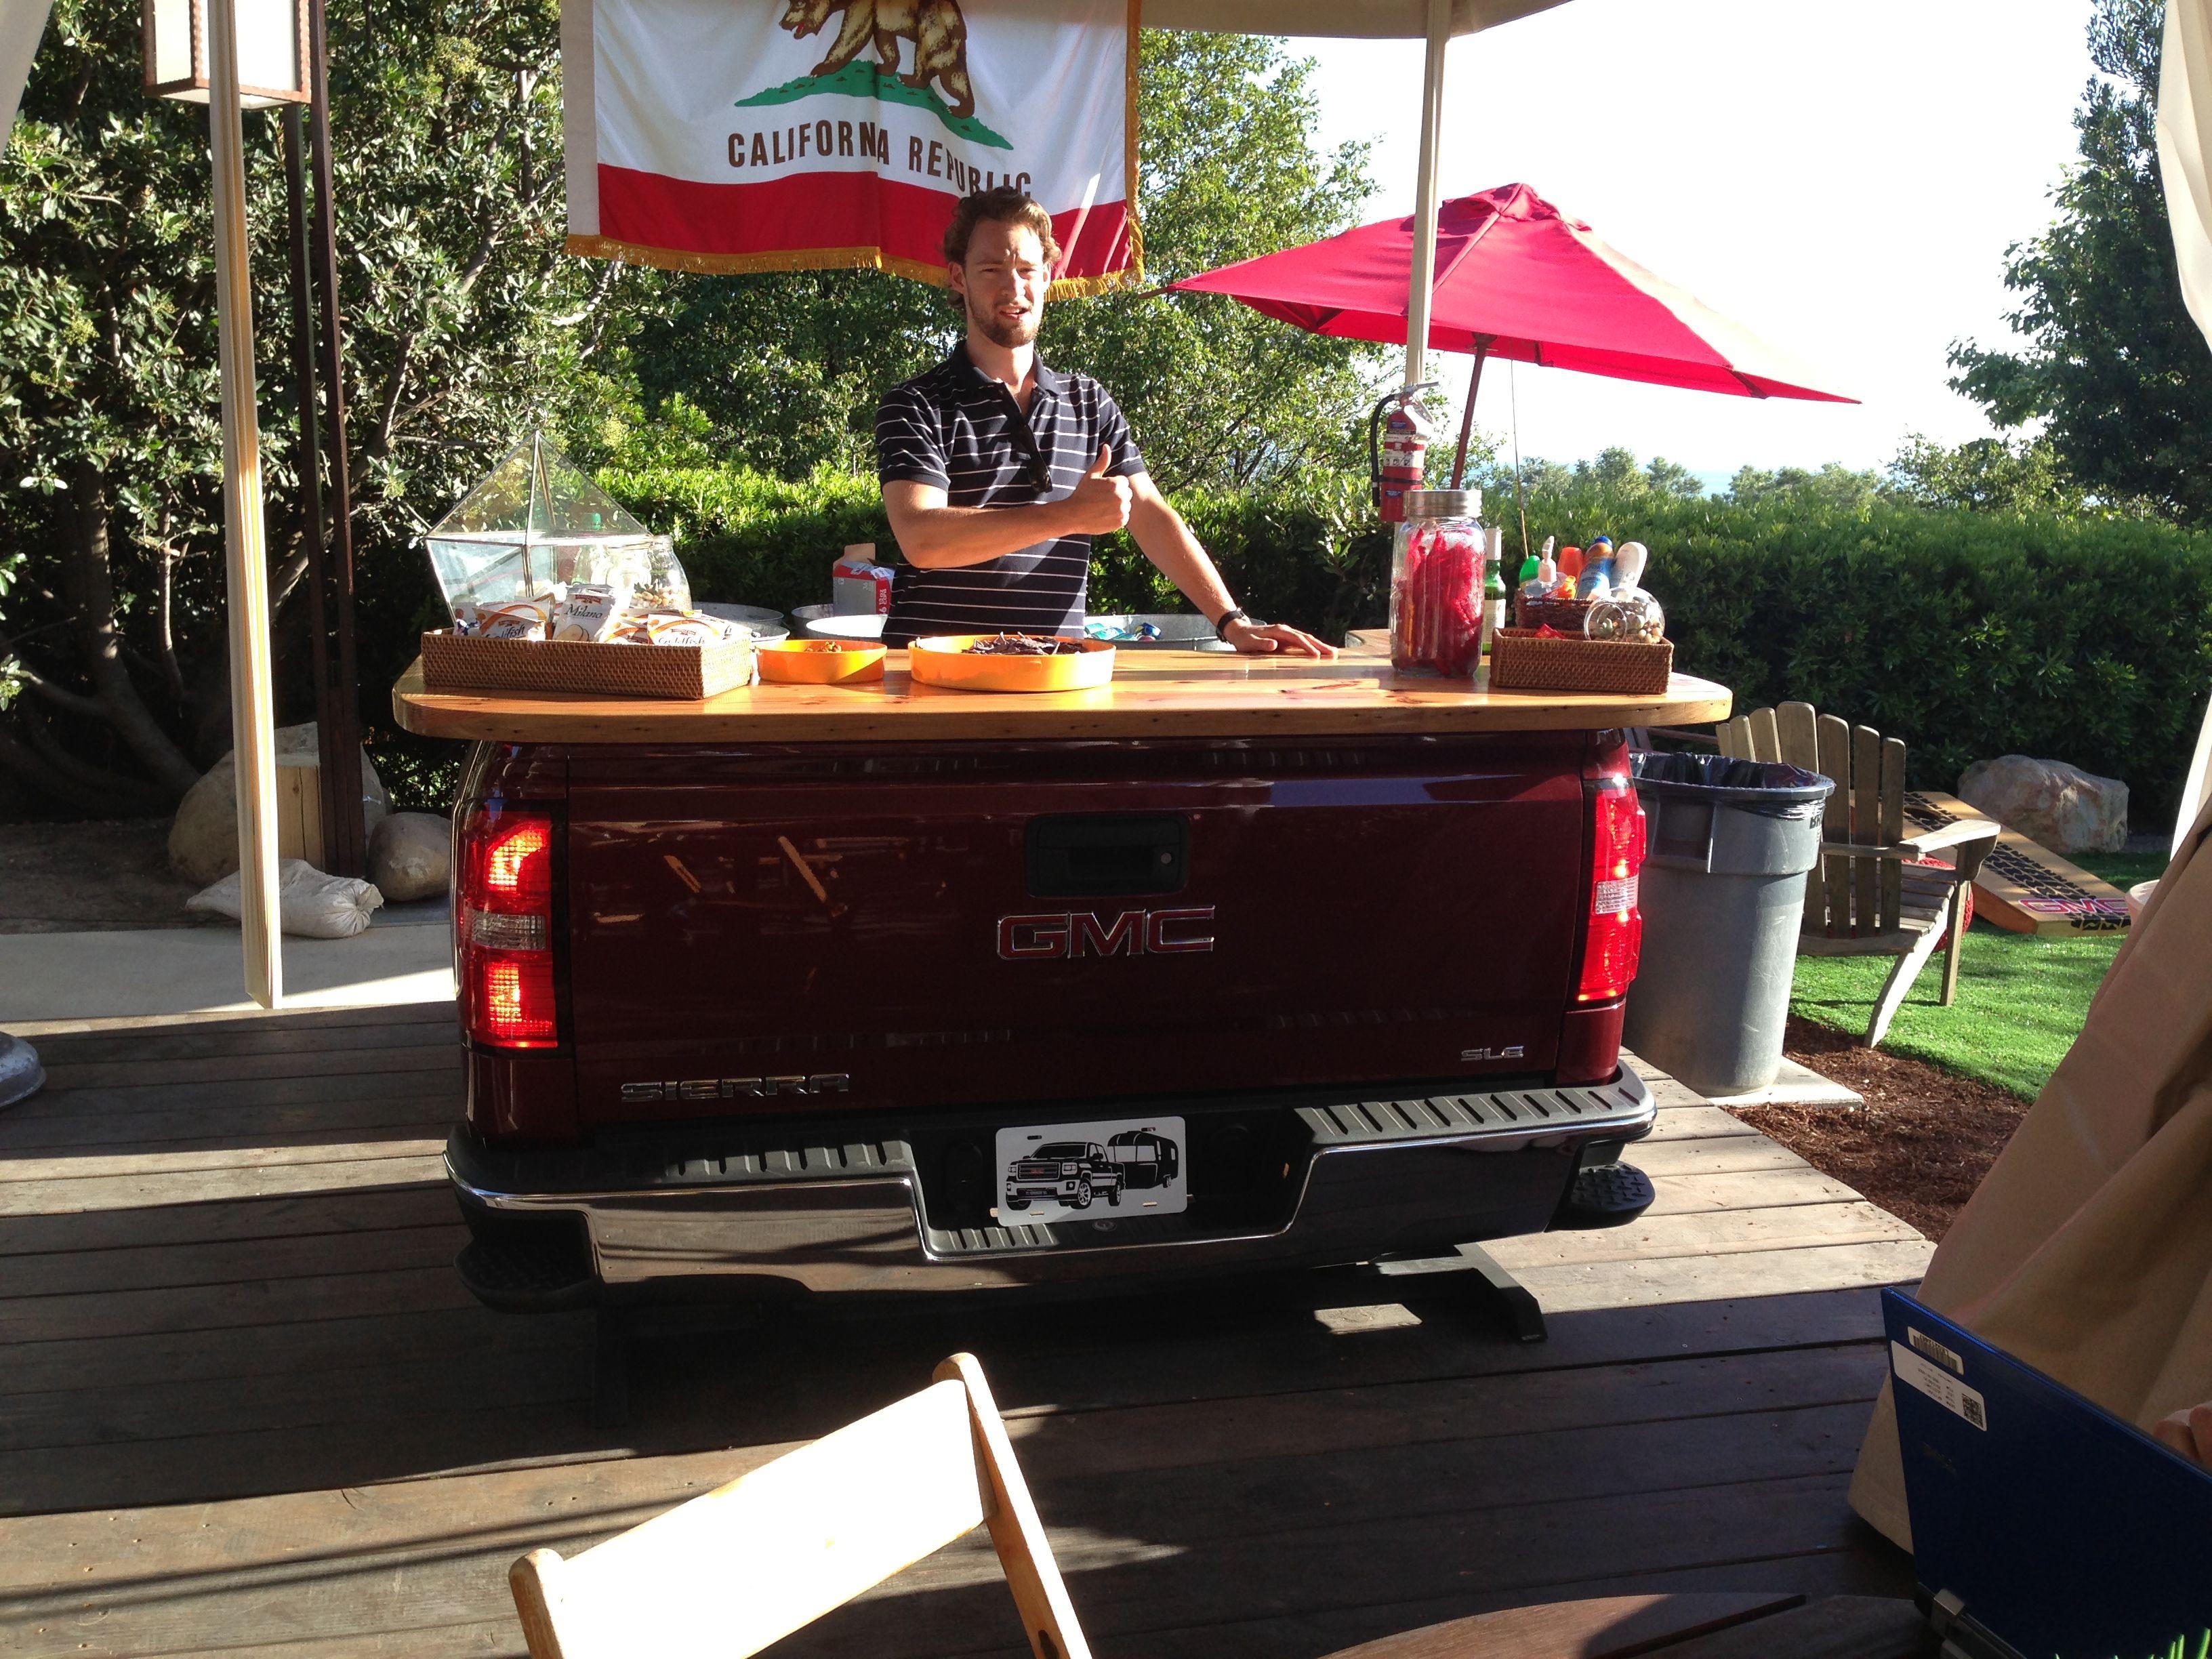 kit arrow capacity truck sale beds for shop tools ford product hoist pierce gmc pickup dump lb